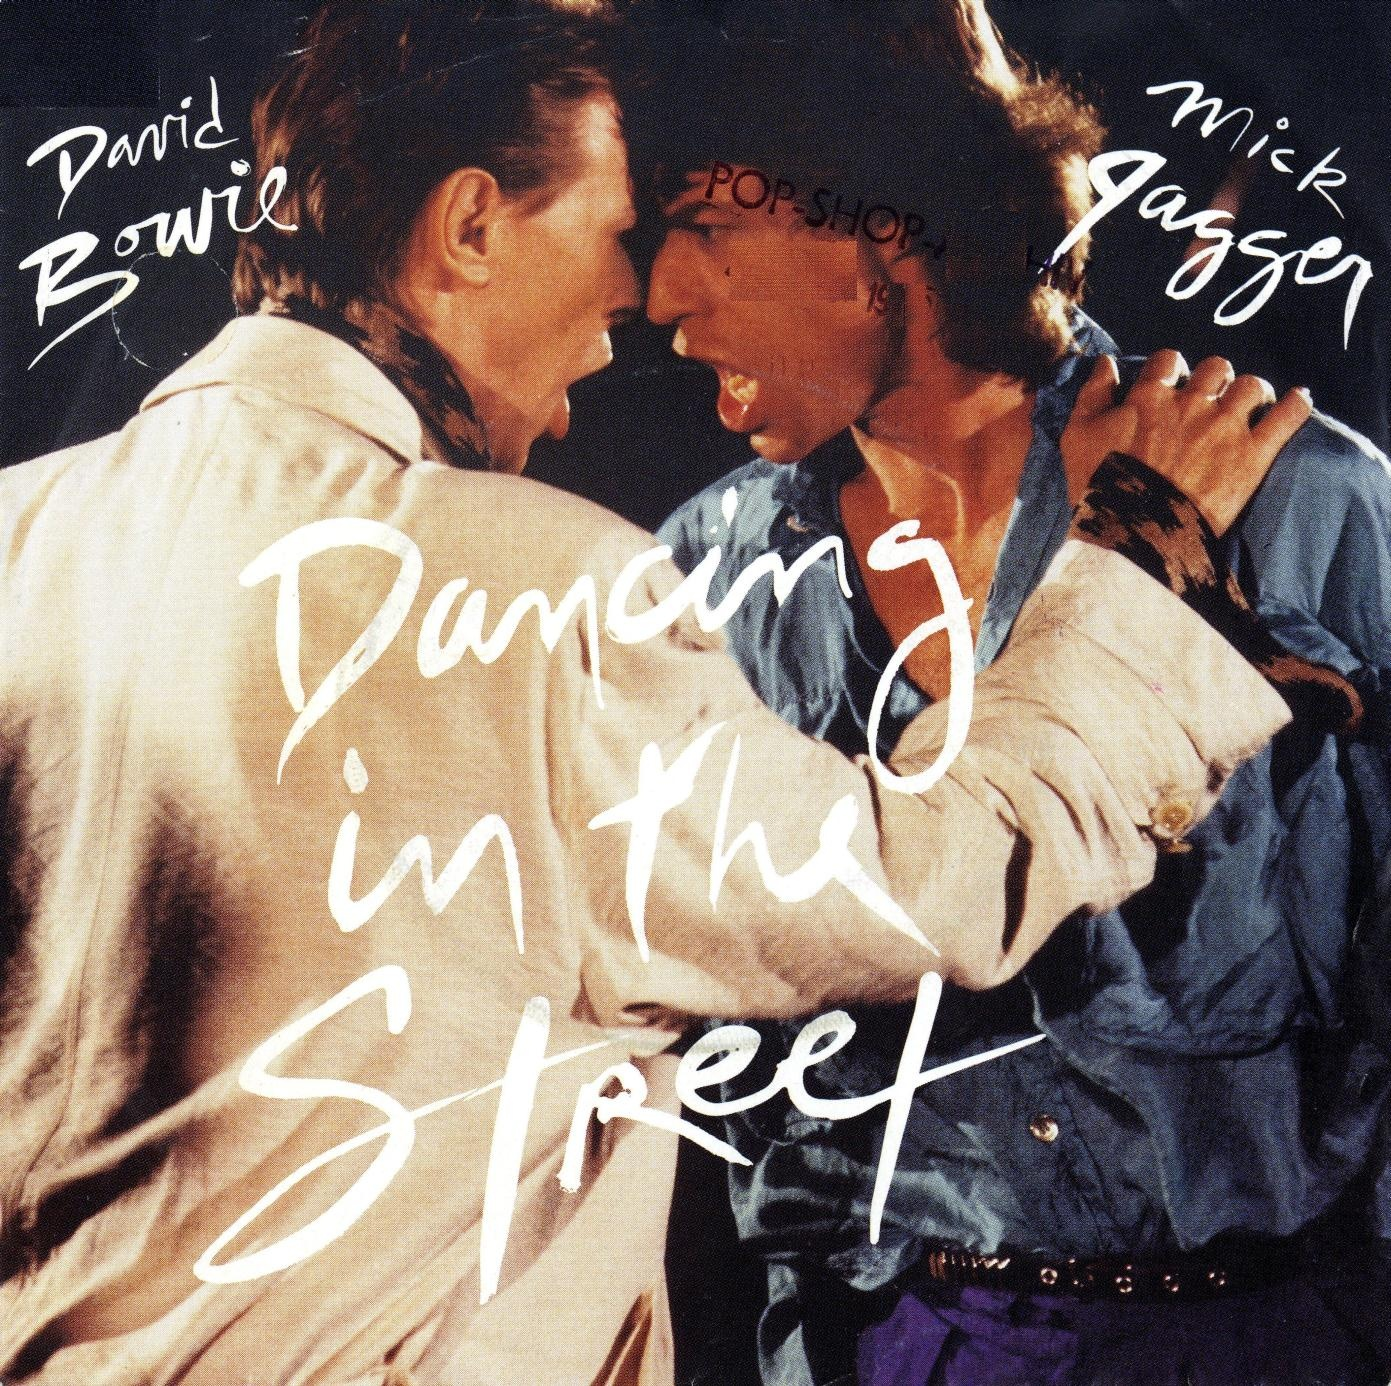 Dancing in the street (Foto: David Bowie)